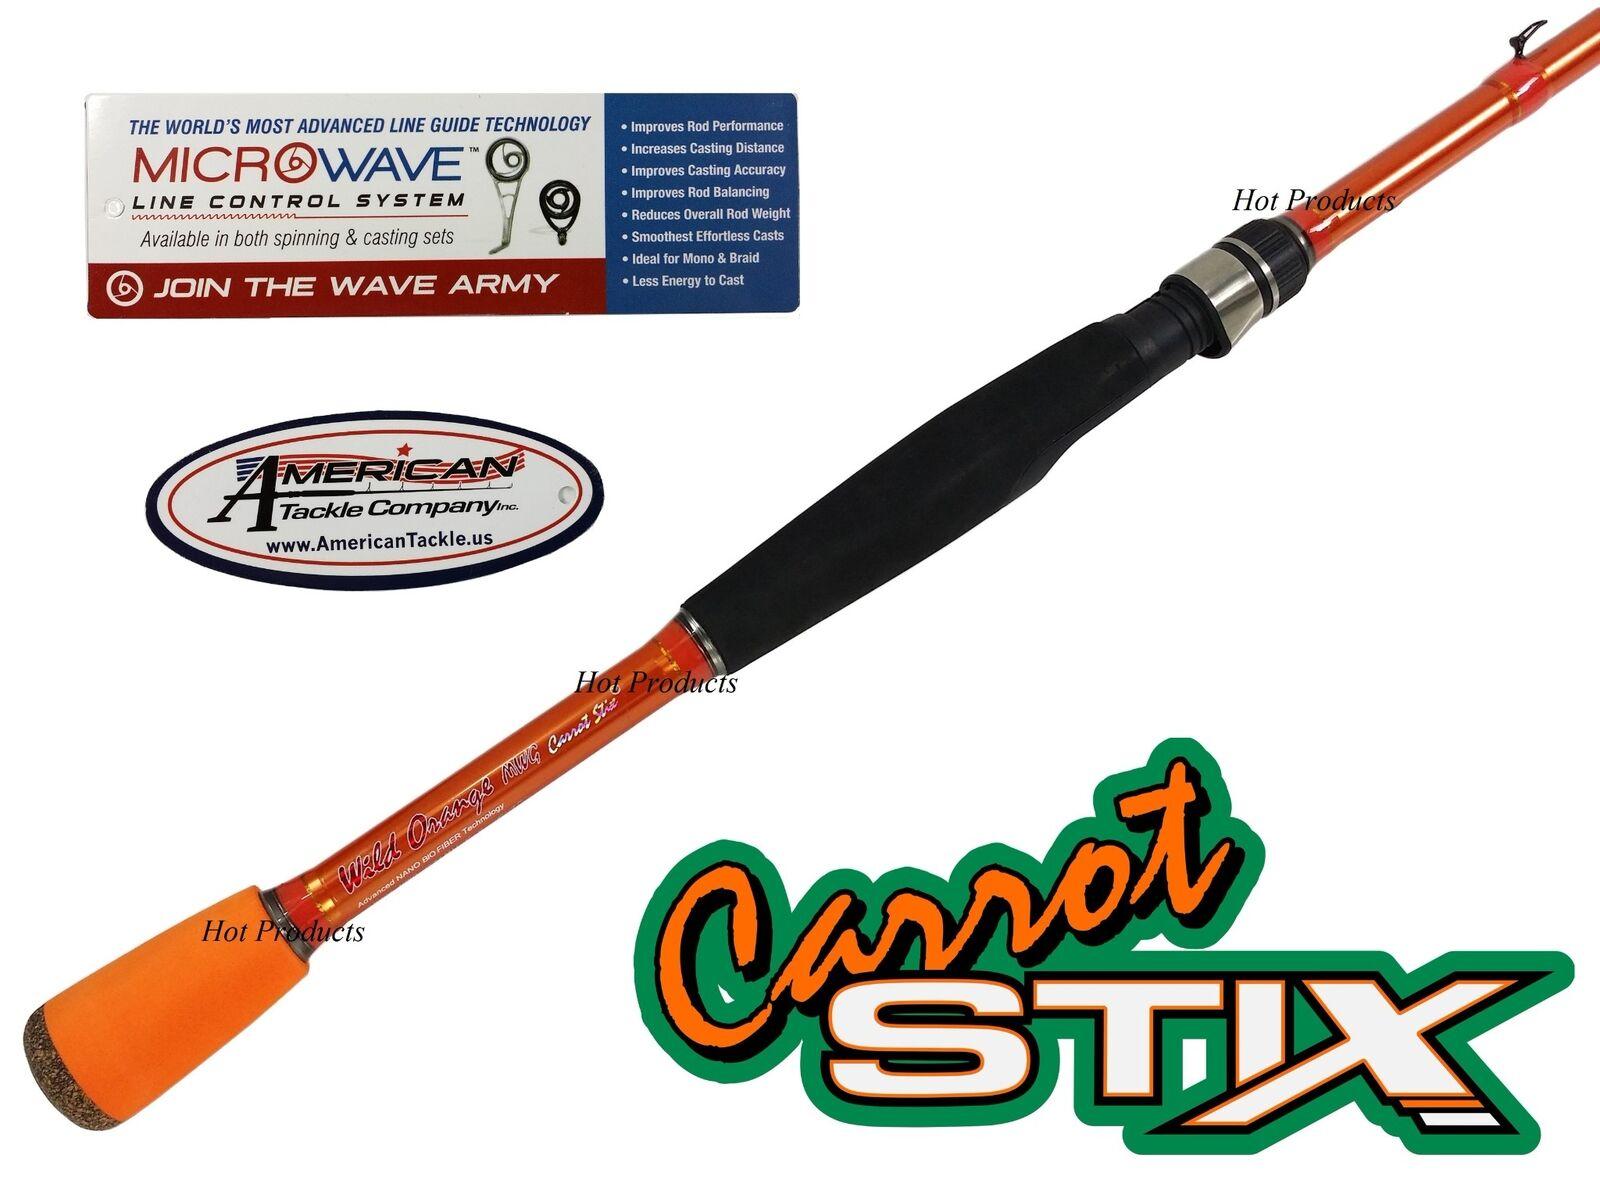 Carred Stix SPINNING 7' Medium WILD orange PLUS W  MicroWave Guides Fishing Rod